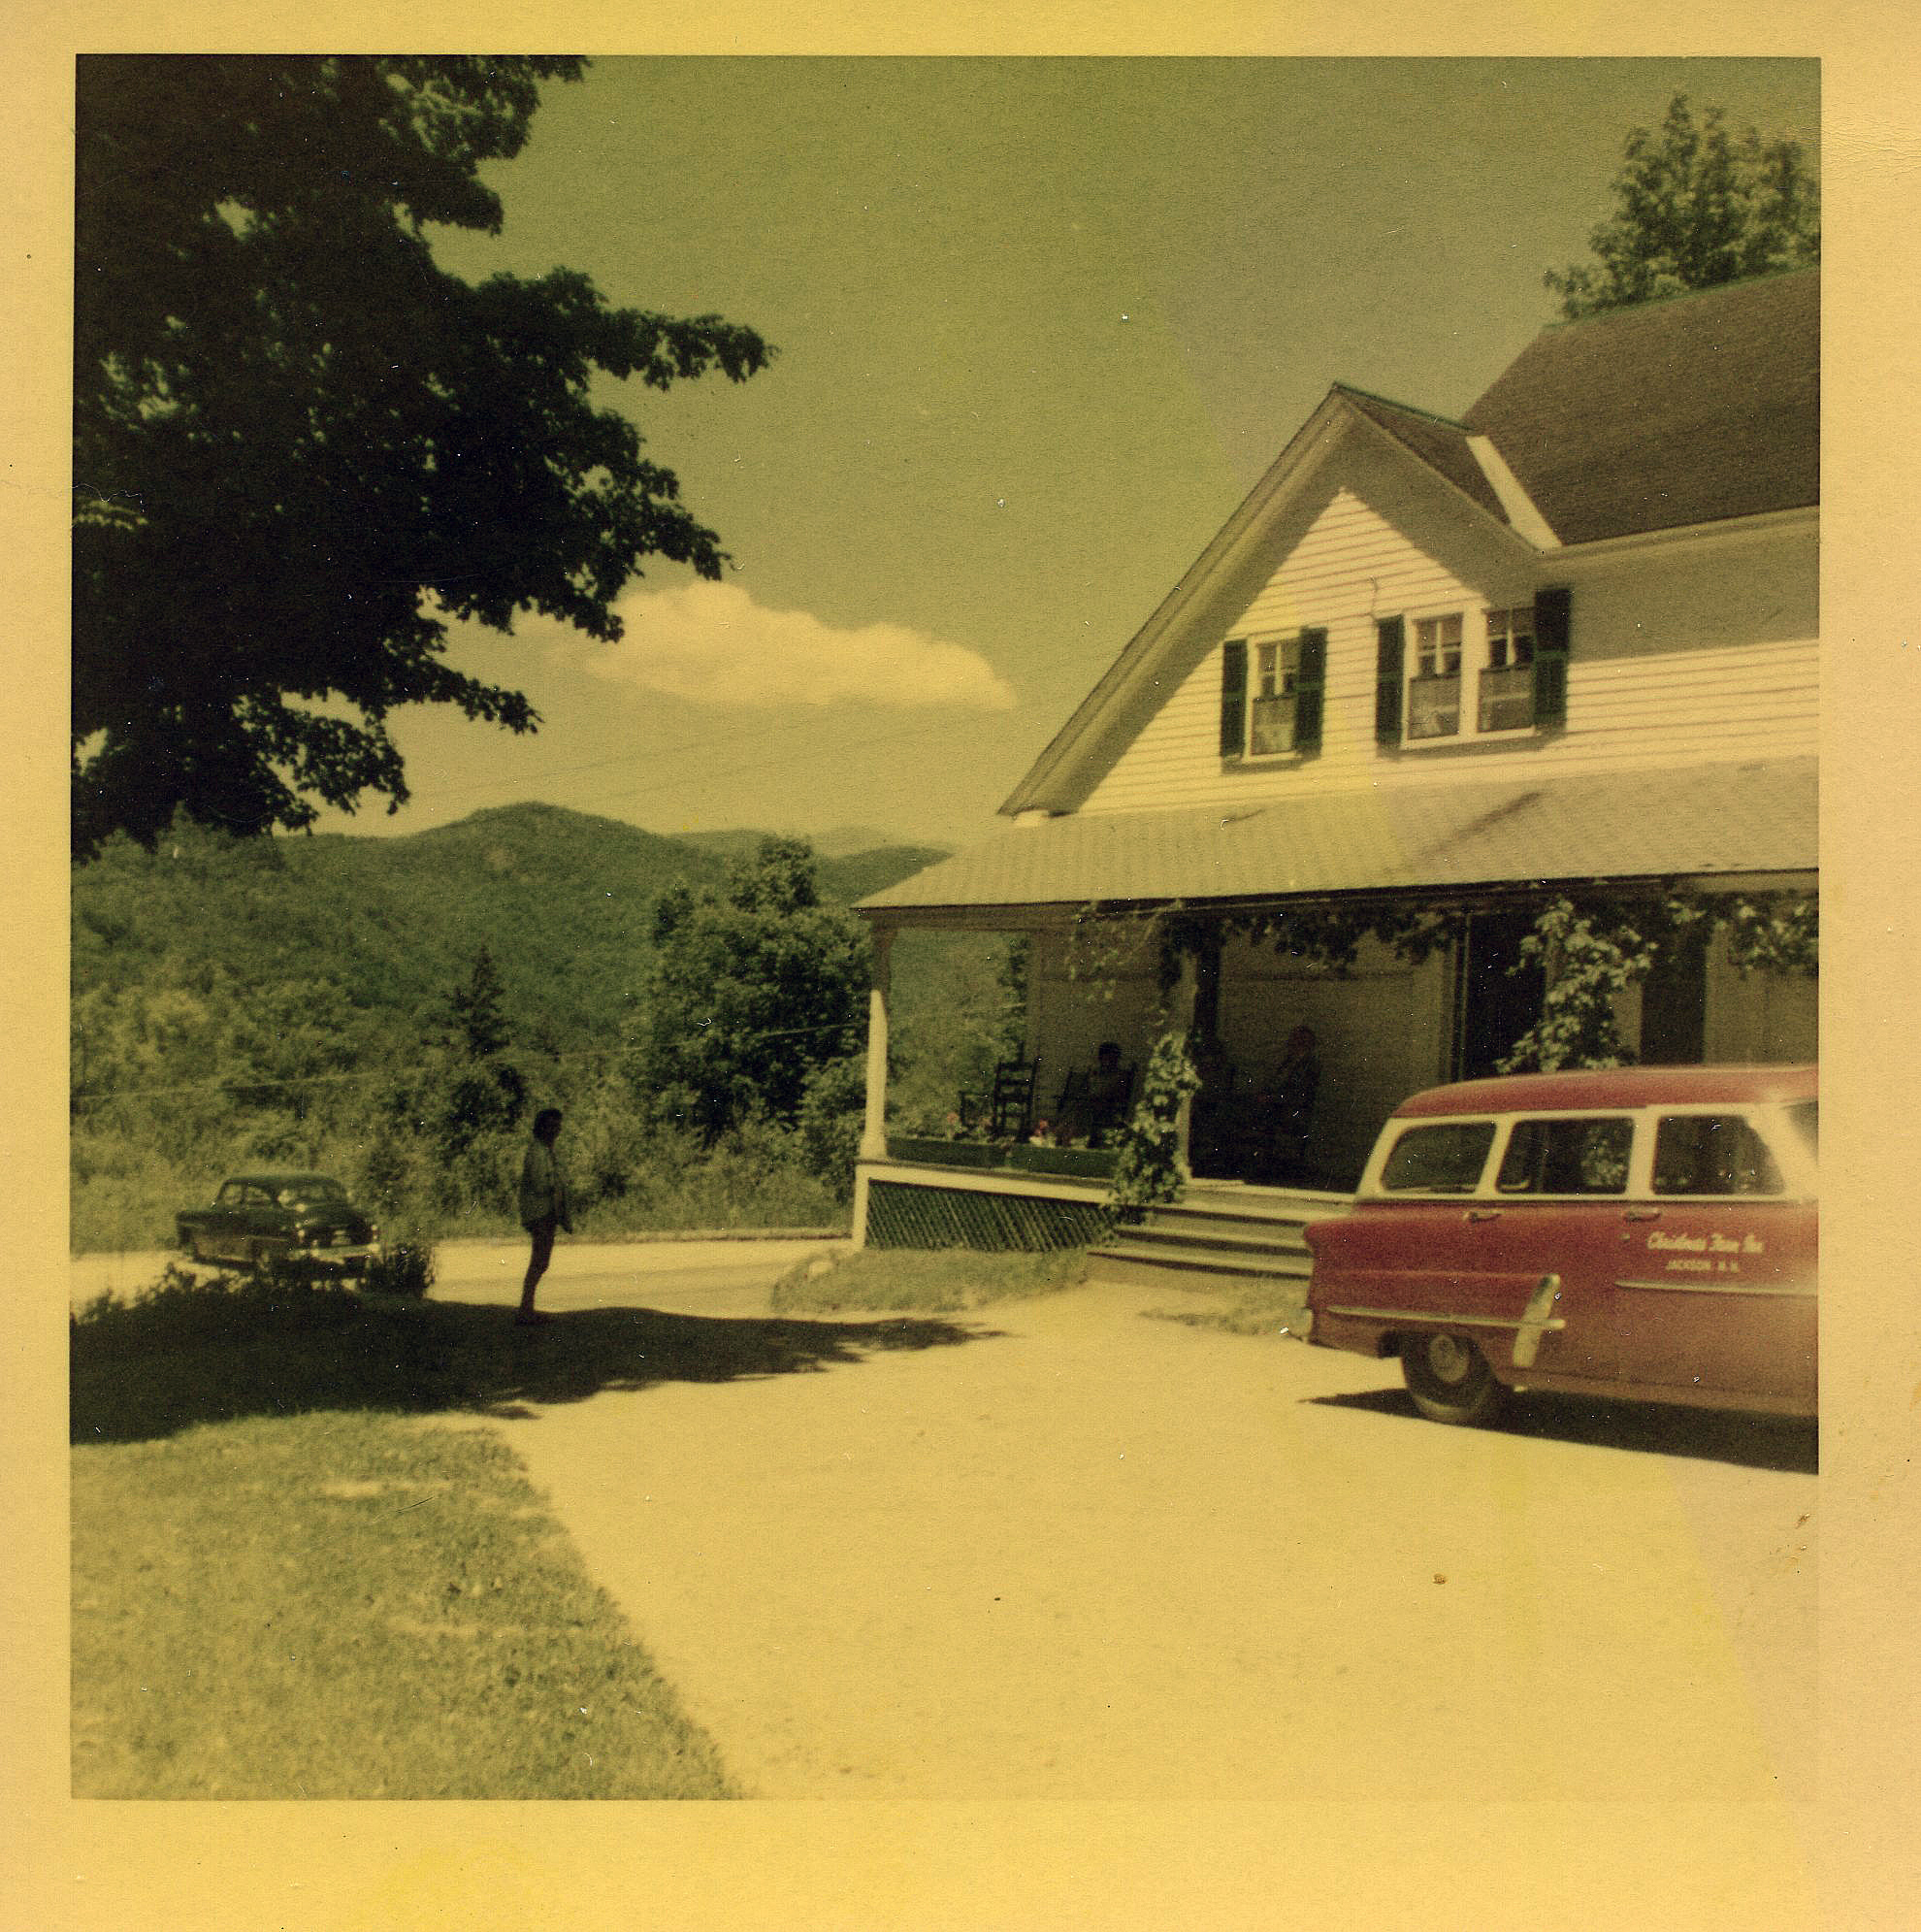 Historical Jackson NH Inn - 1954